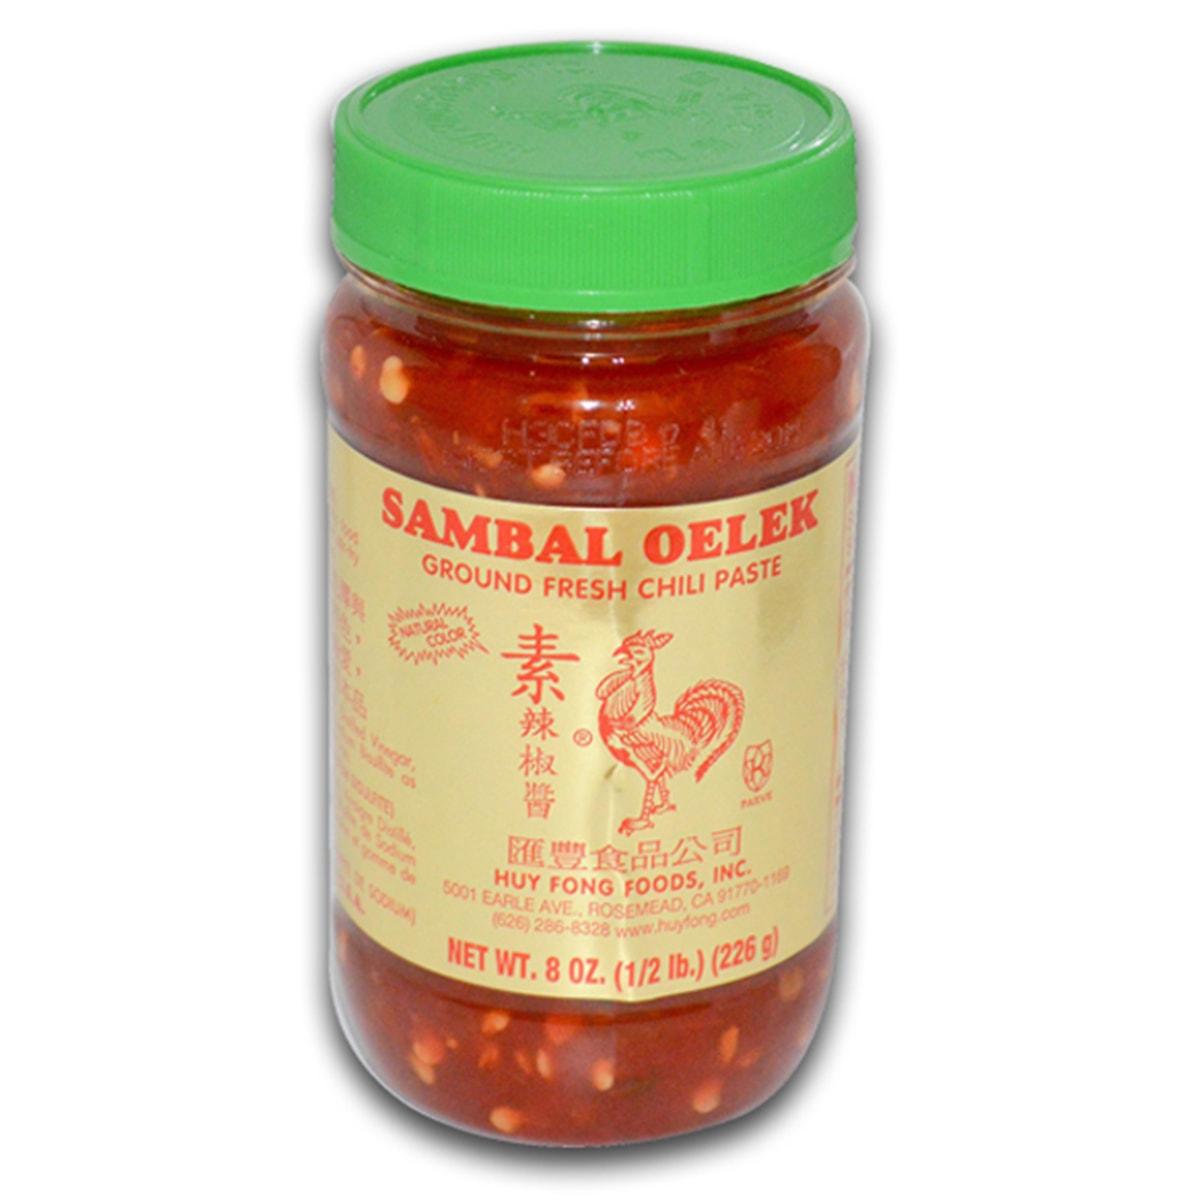 Buy Huy Fong Foods Sambal Oelek (Ground Fresh Chili Paste) - 226 gm